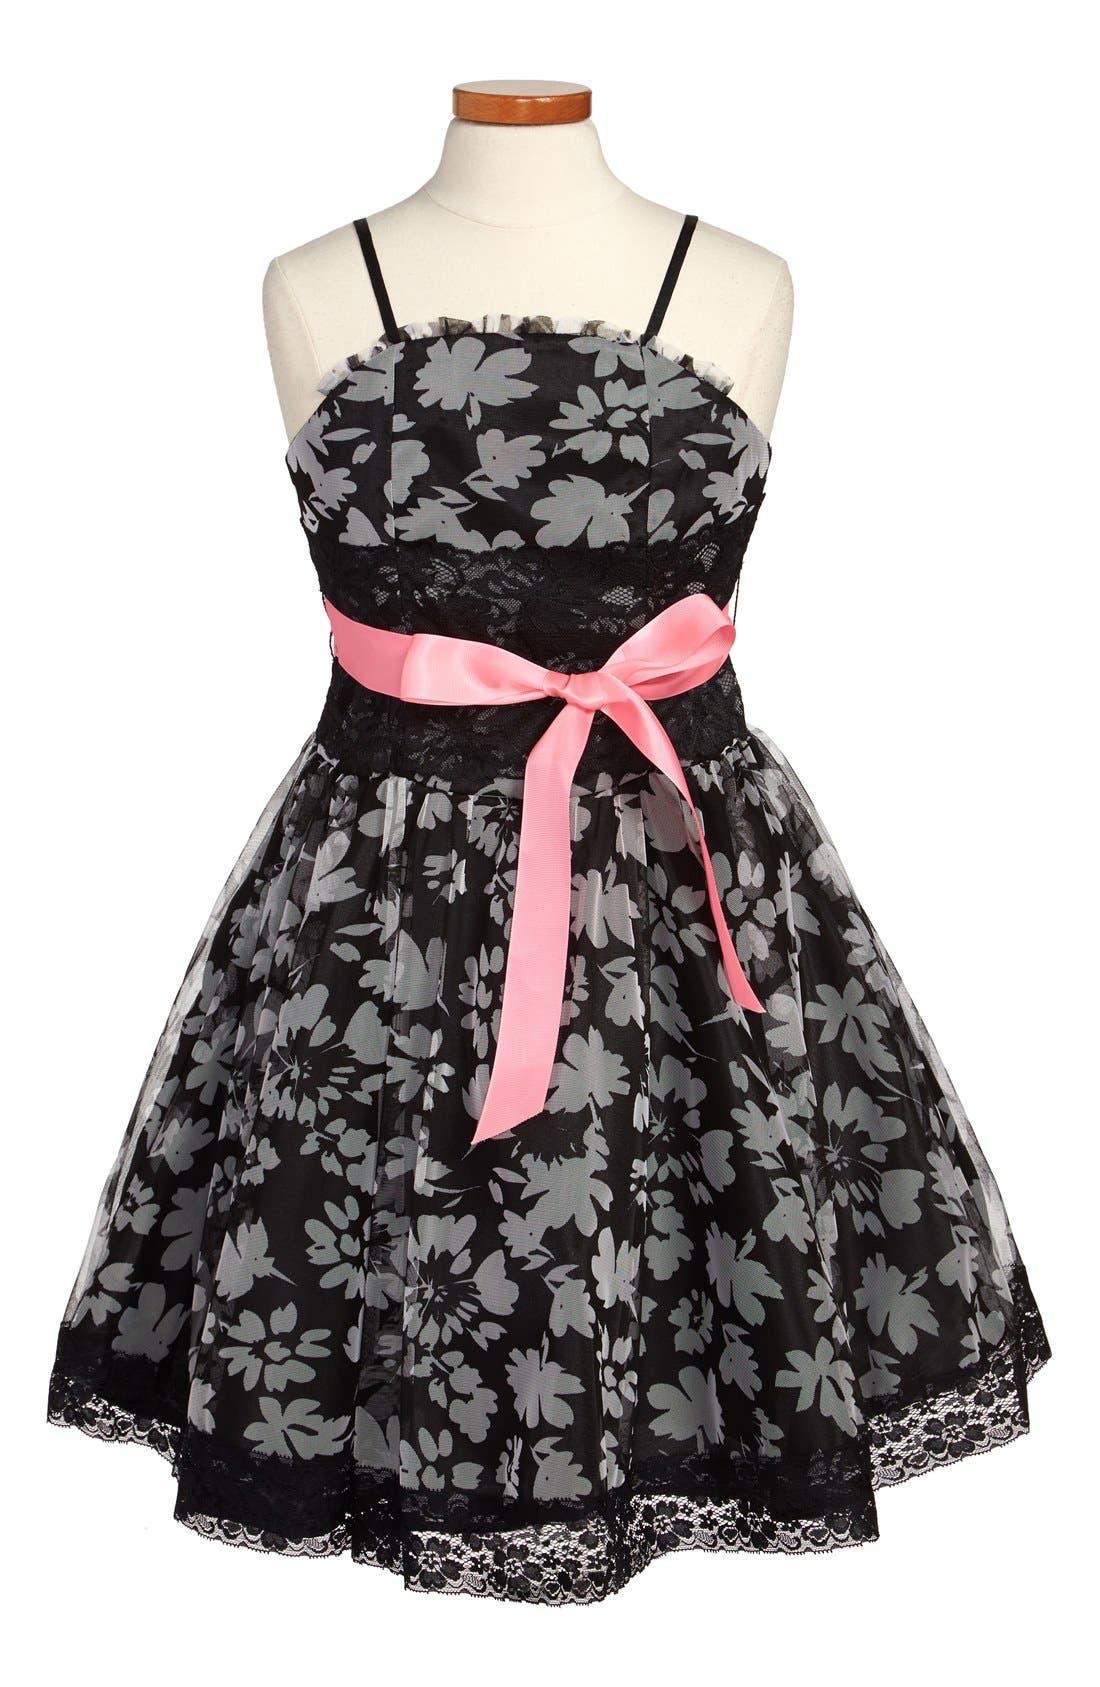 Main Image - Dorissa 'Peggy' Floral Print Dress (Big Girls)